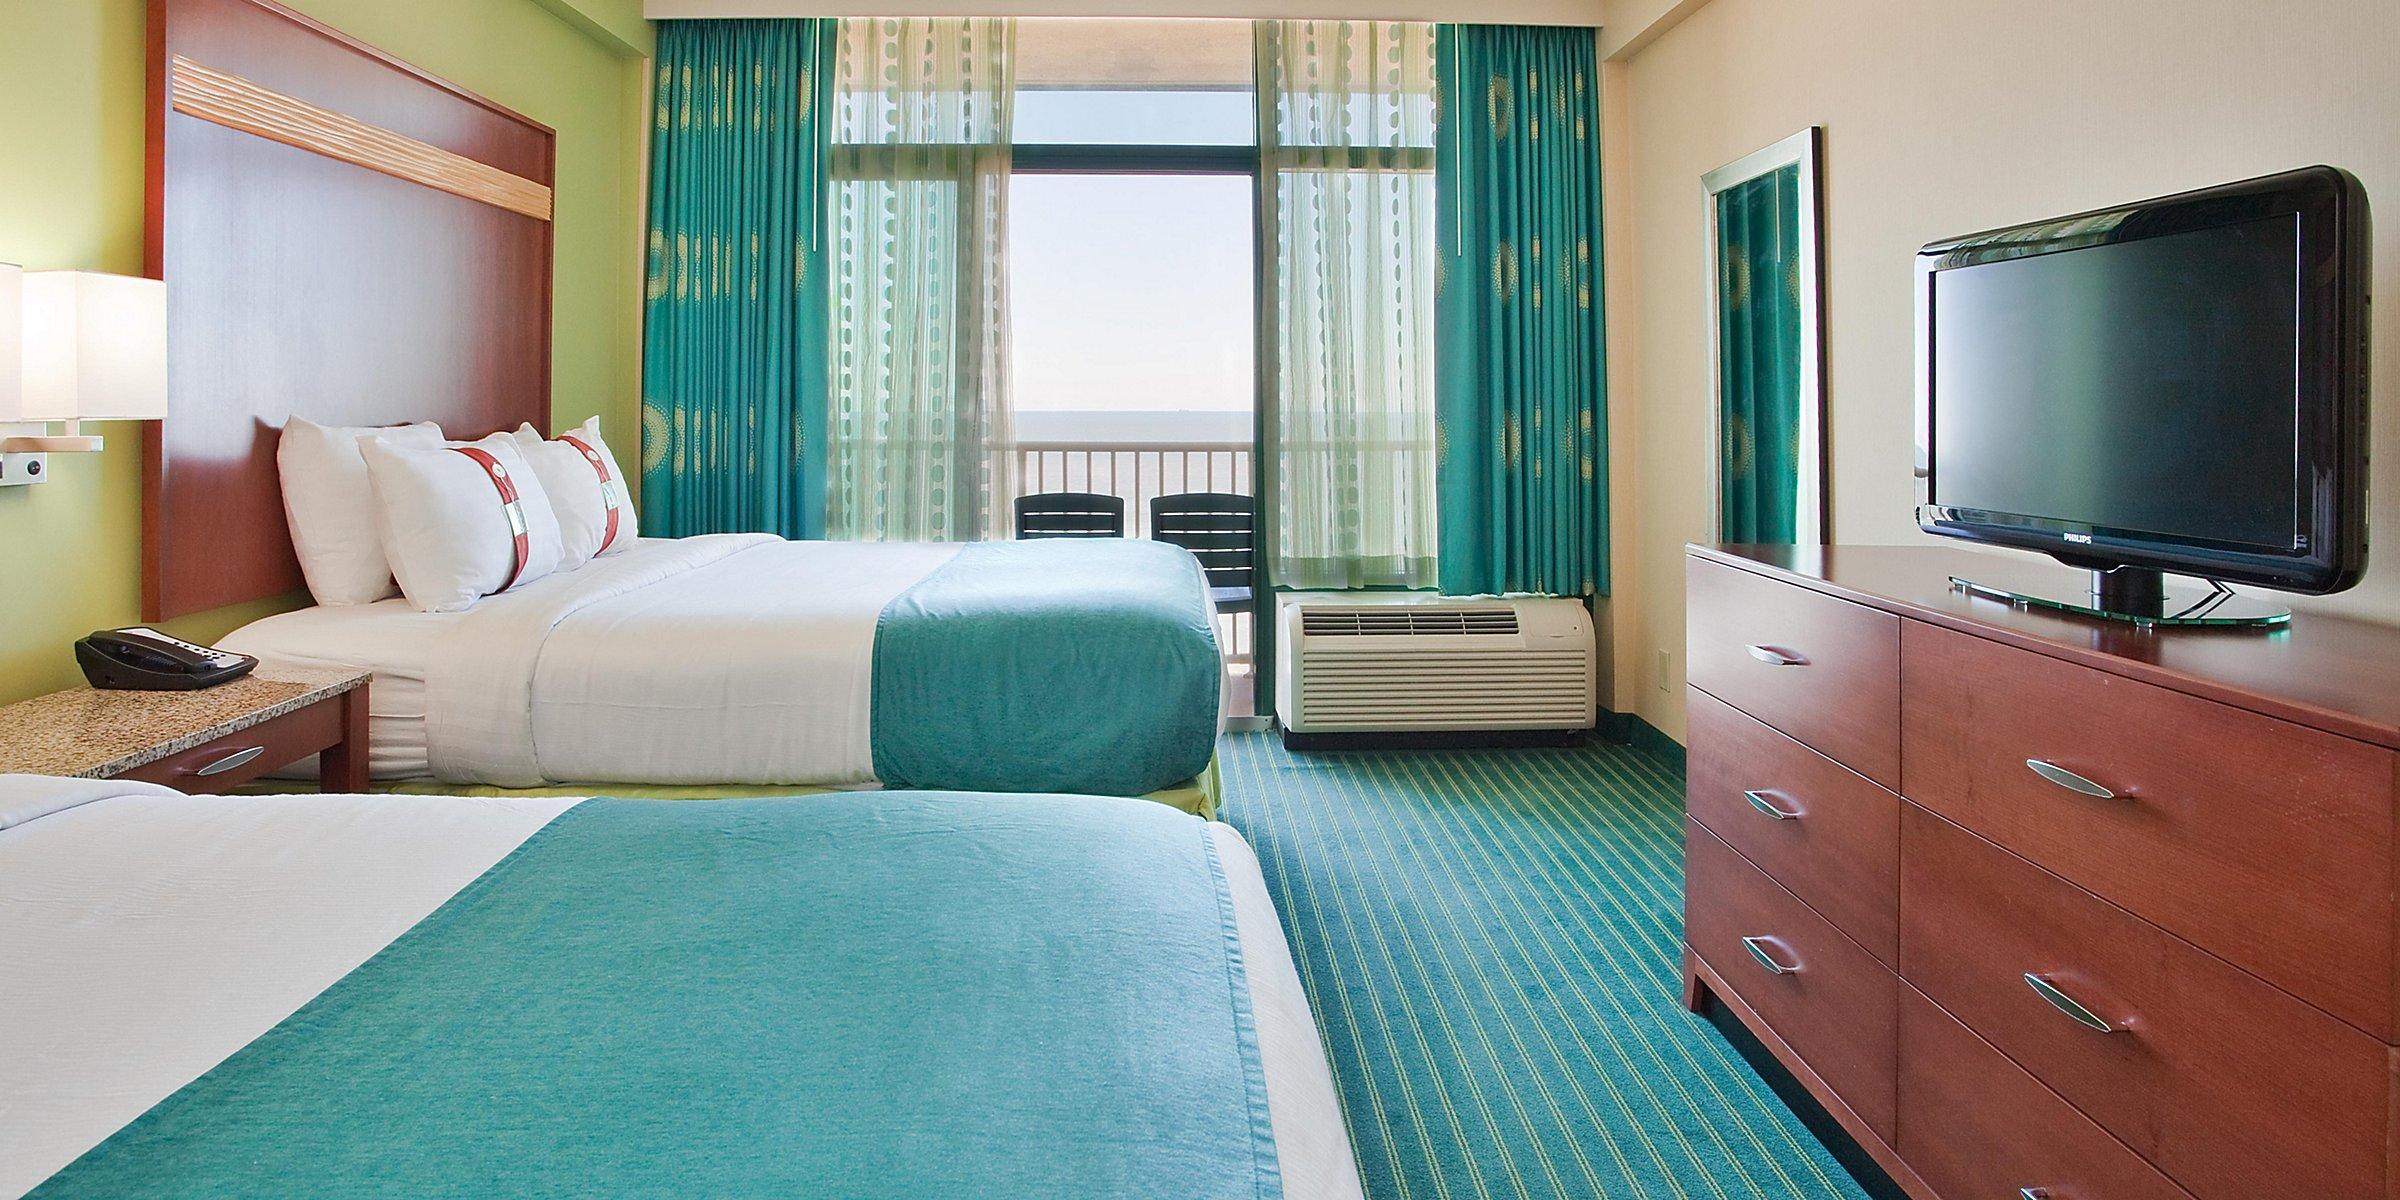 North Virginia Beach Boardwalk Hotels Holiday Inn Suites Virginia Beach North Beach